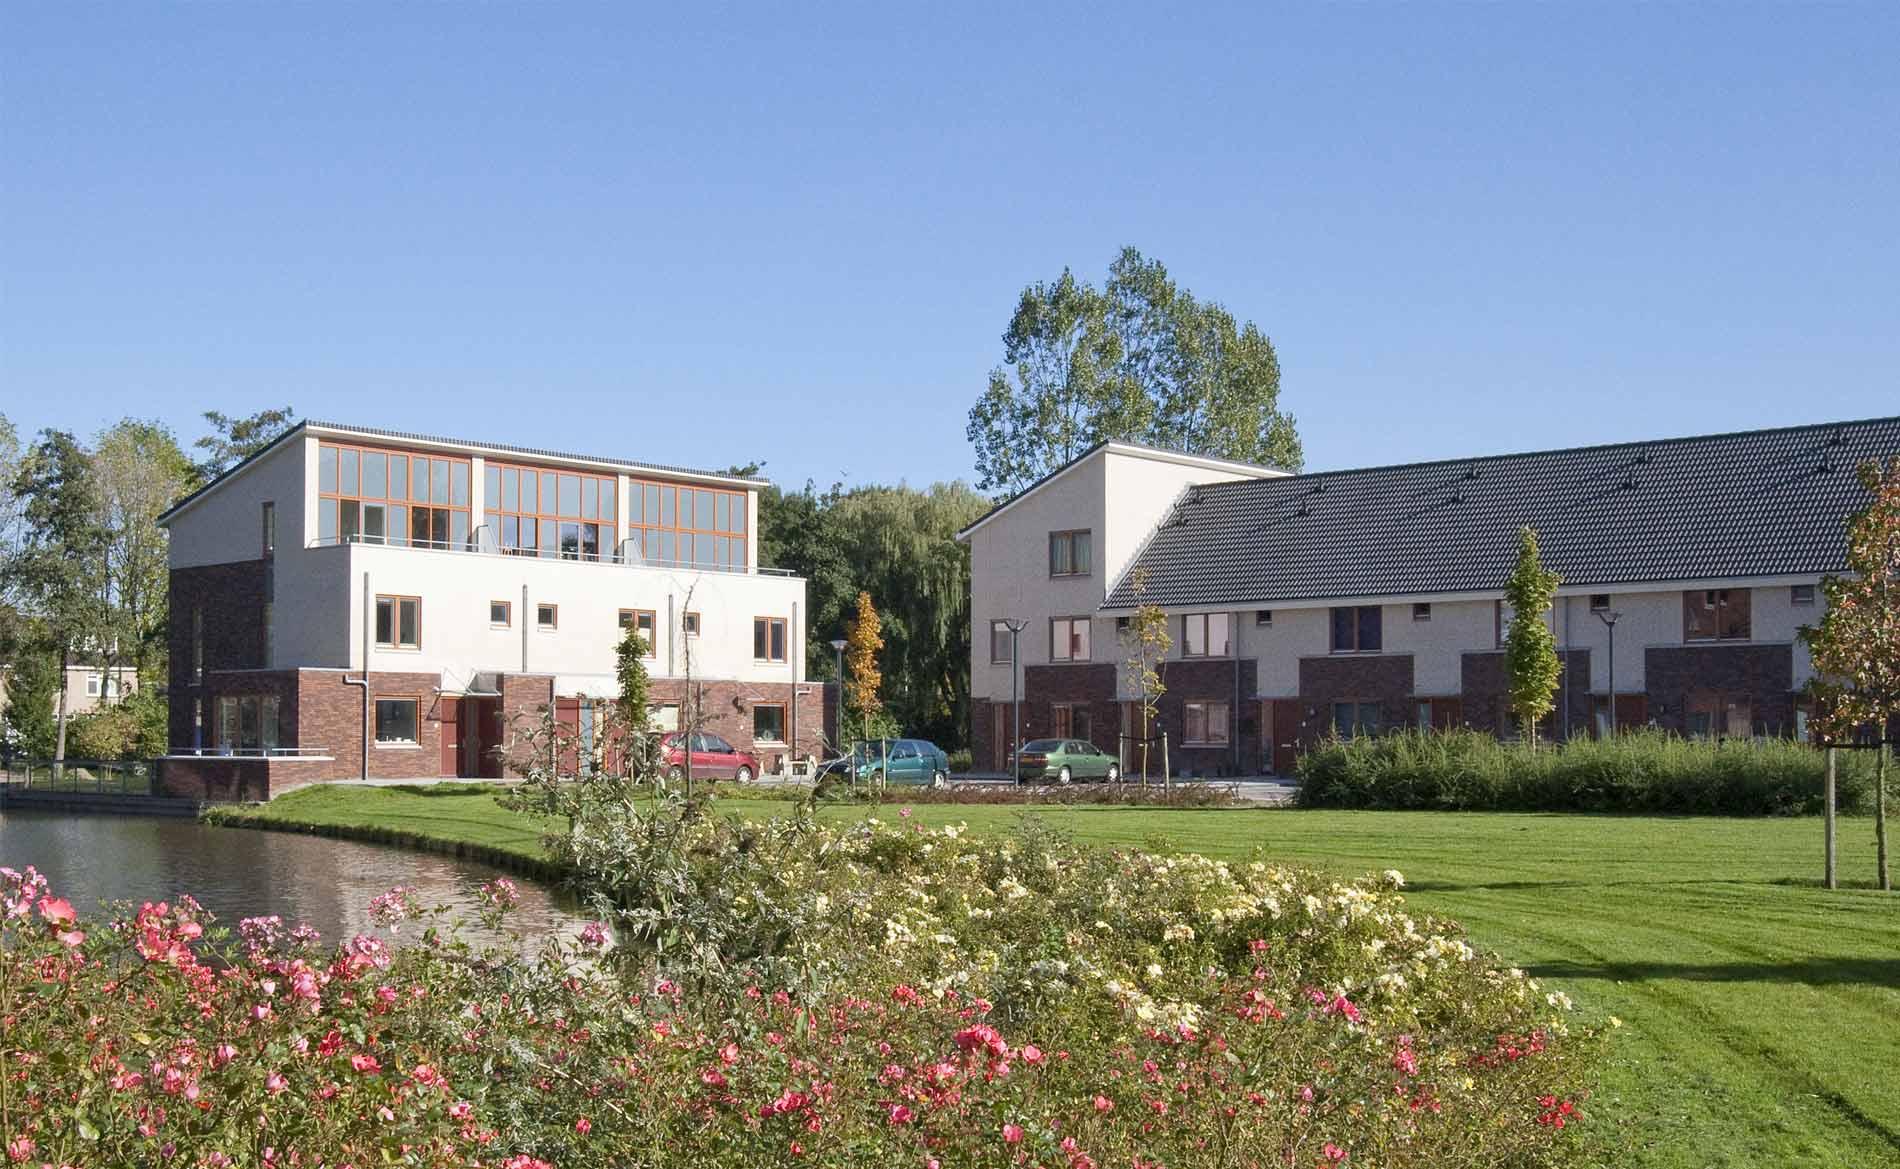 Stadsvernieuwing Heemskerk Waterrijck stedenbouwkundig plan park BBHD architecten